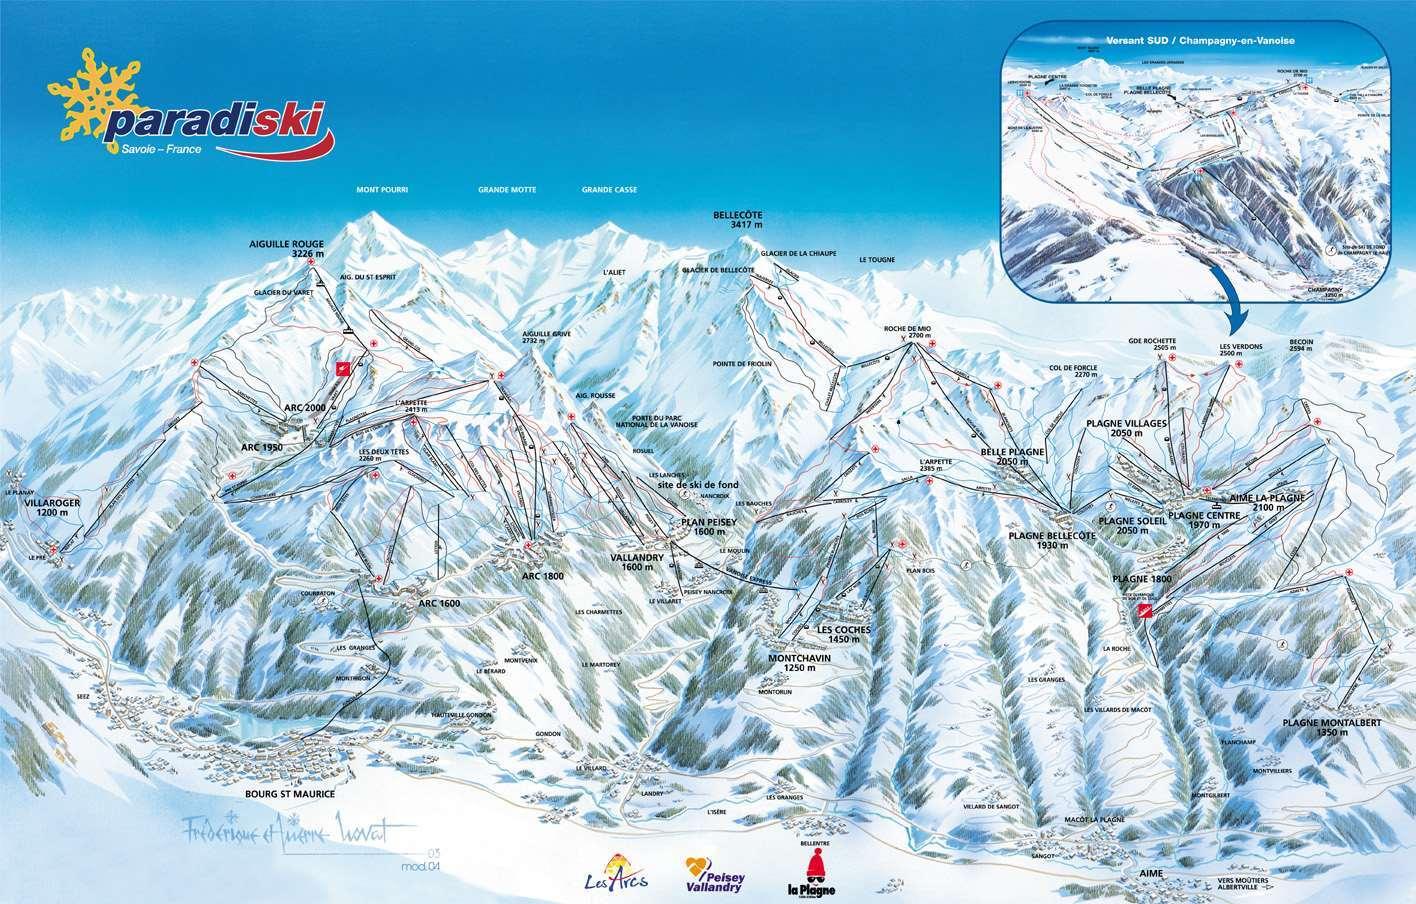 Plagne Soleil Skiing Holidays Ski Holiday Plagne Soleil France Igluski Com